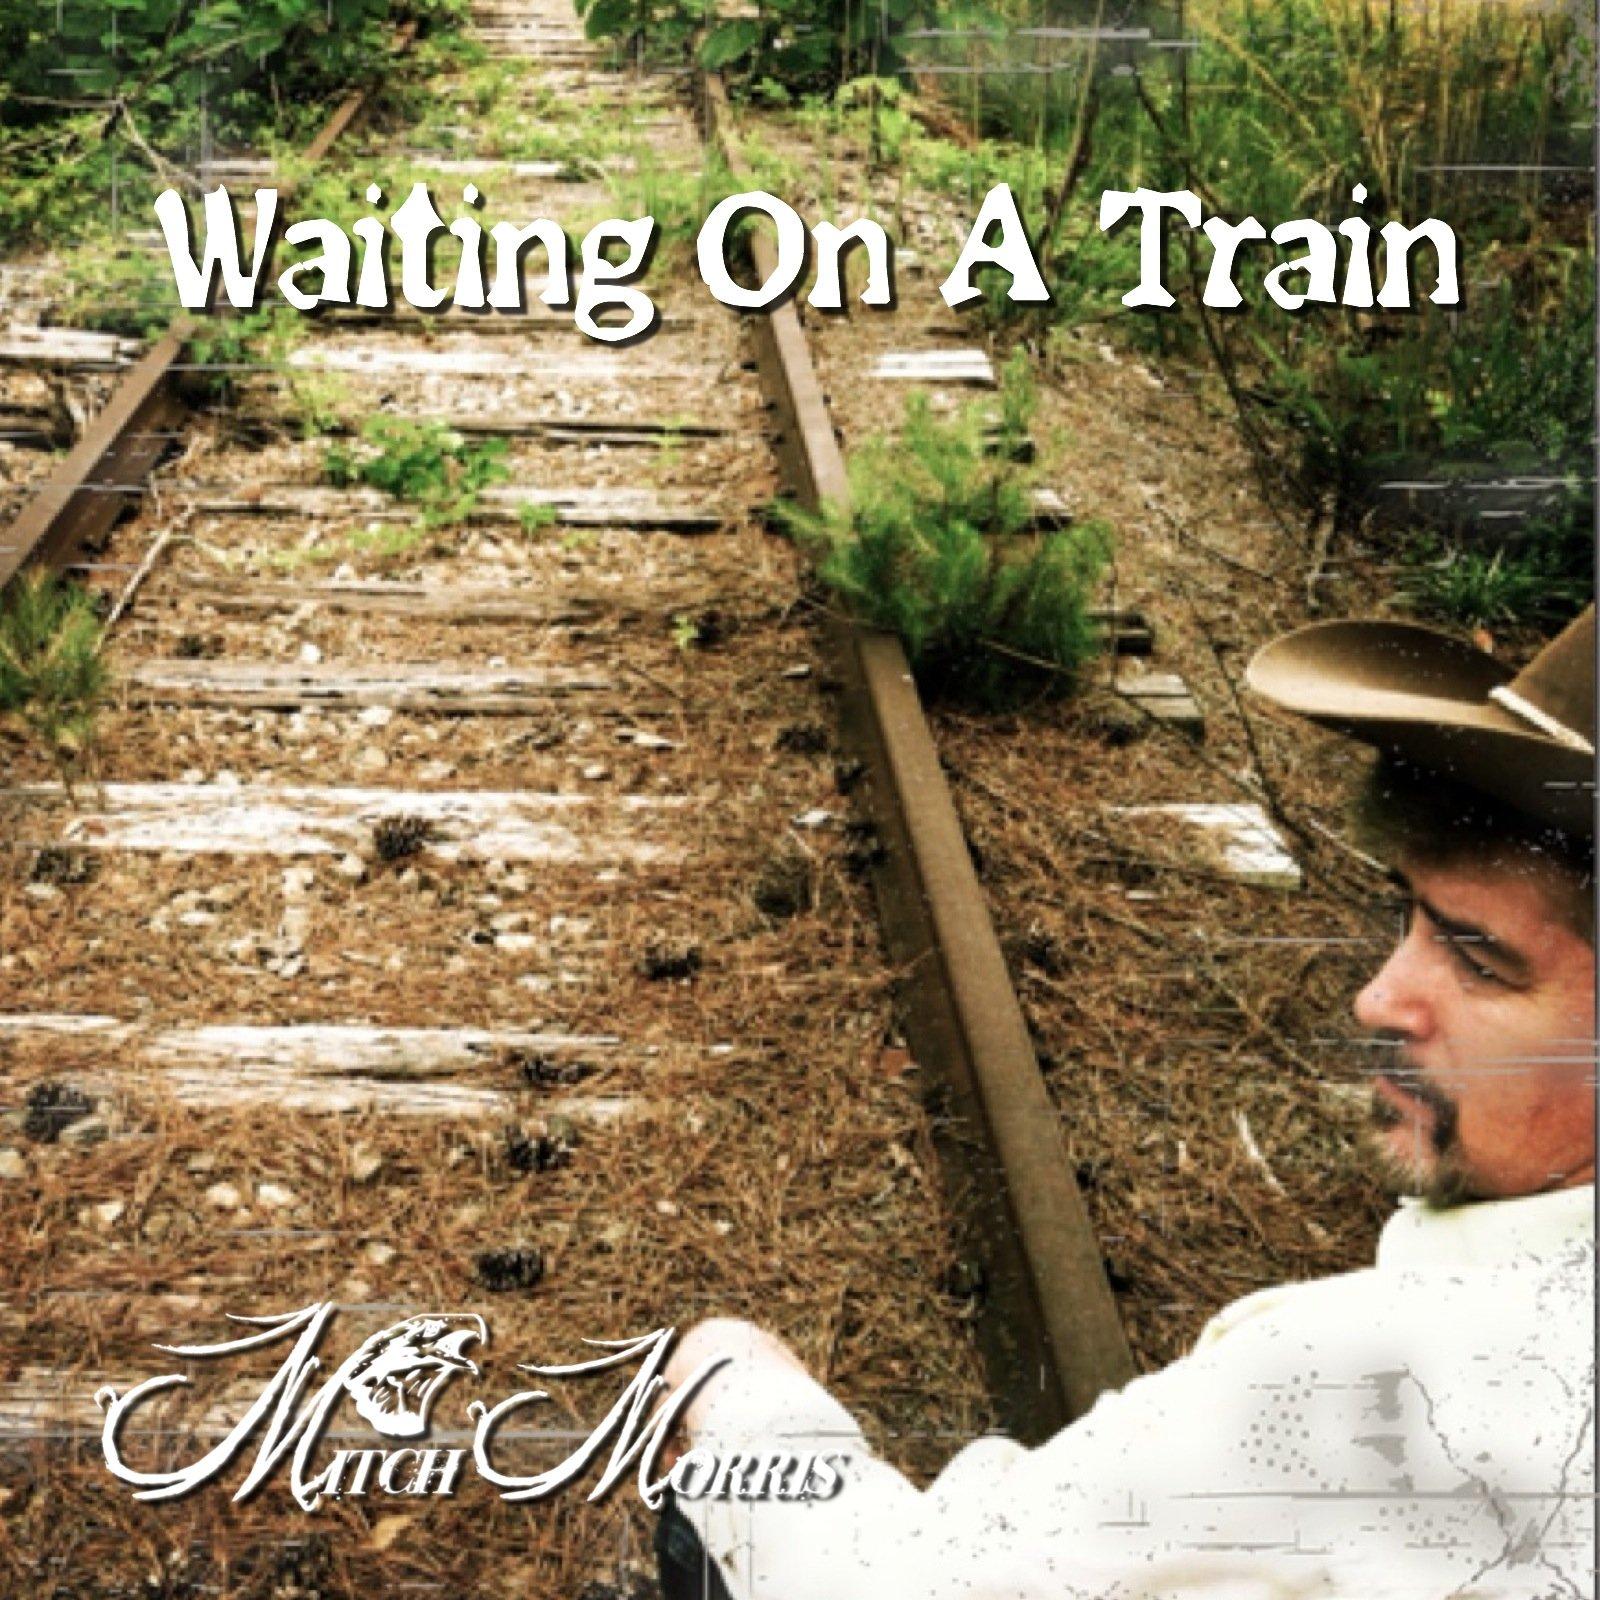 Mitch Morris Music, Lyrics, Songs, and Videos